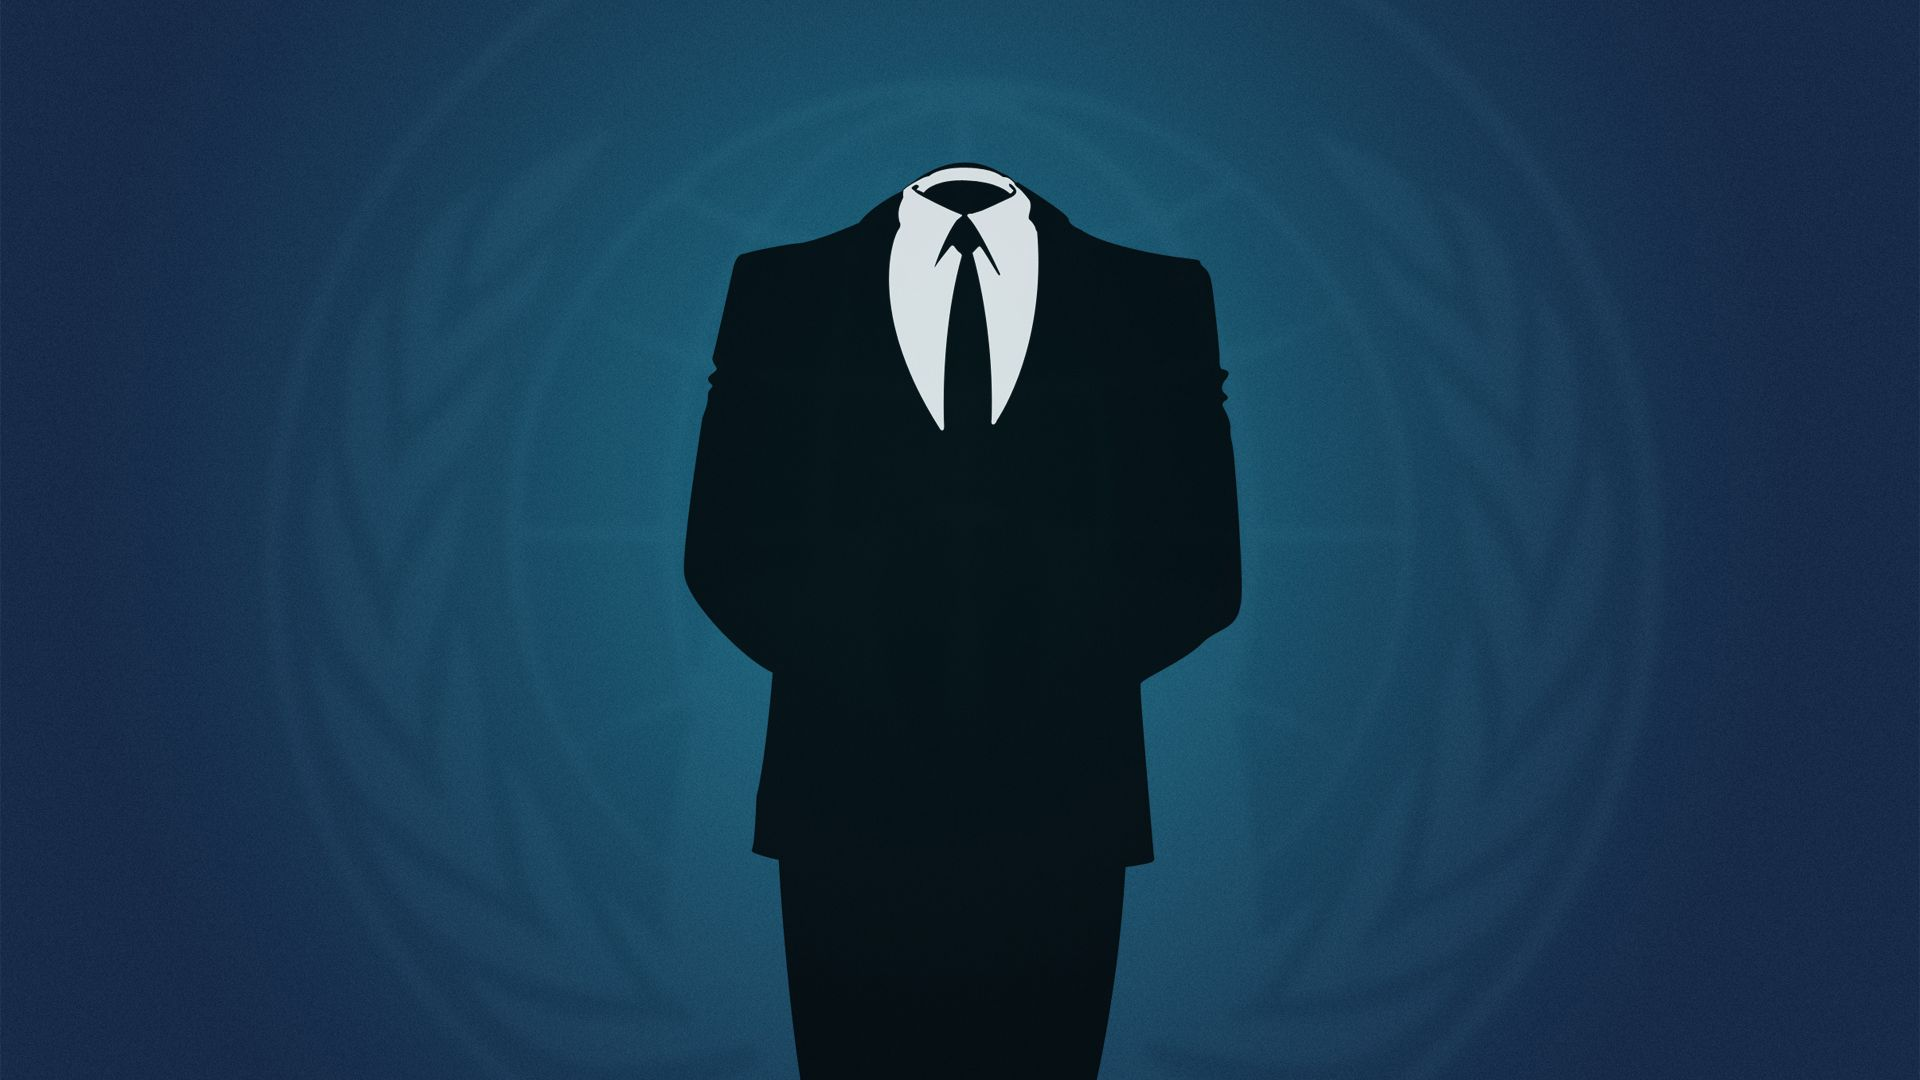 Anonymous Wallpapers HD Wallpapers | HD Wallpapers ...